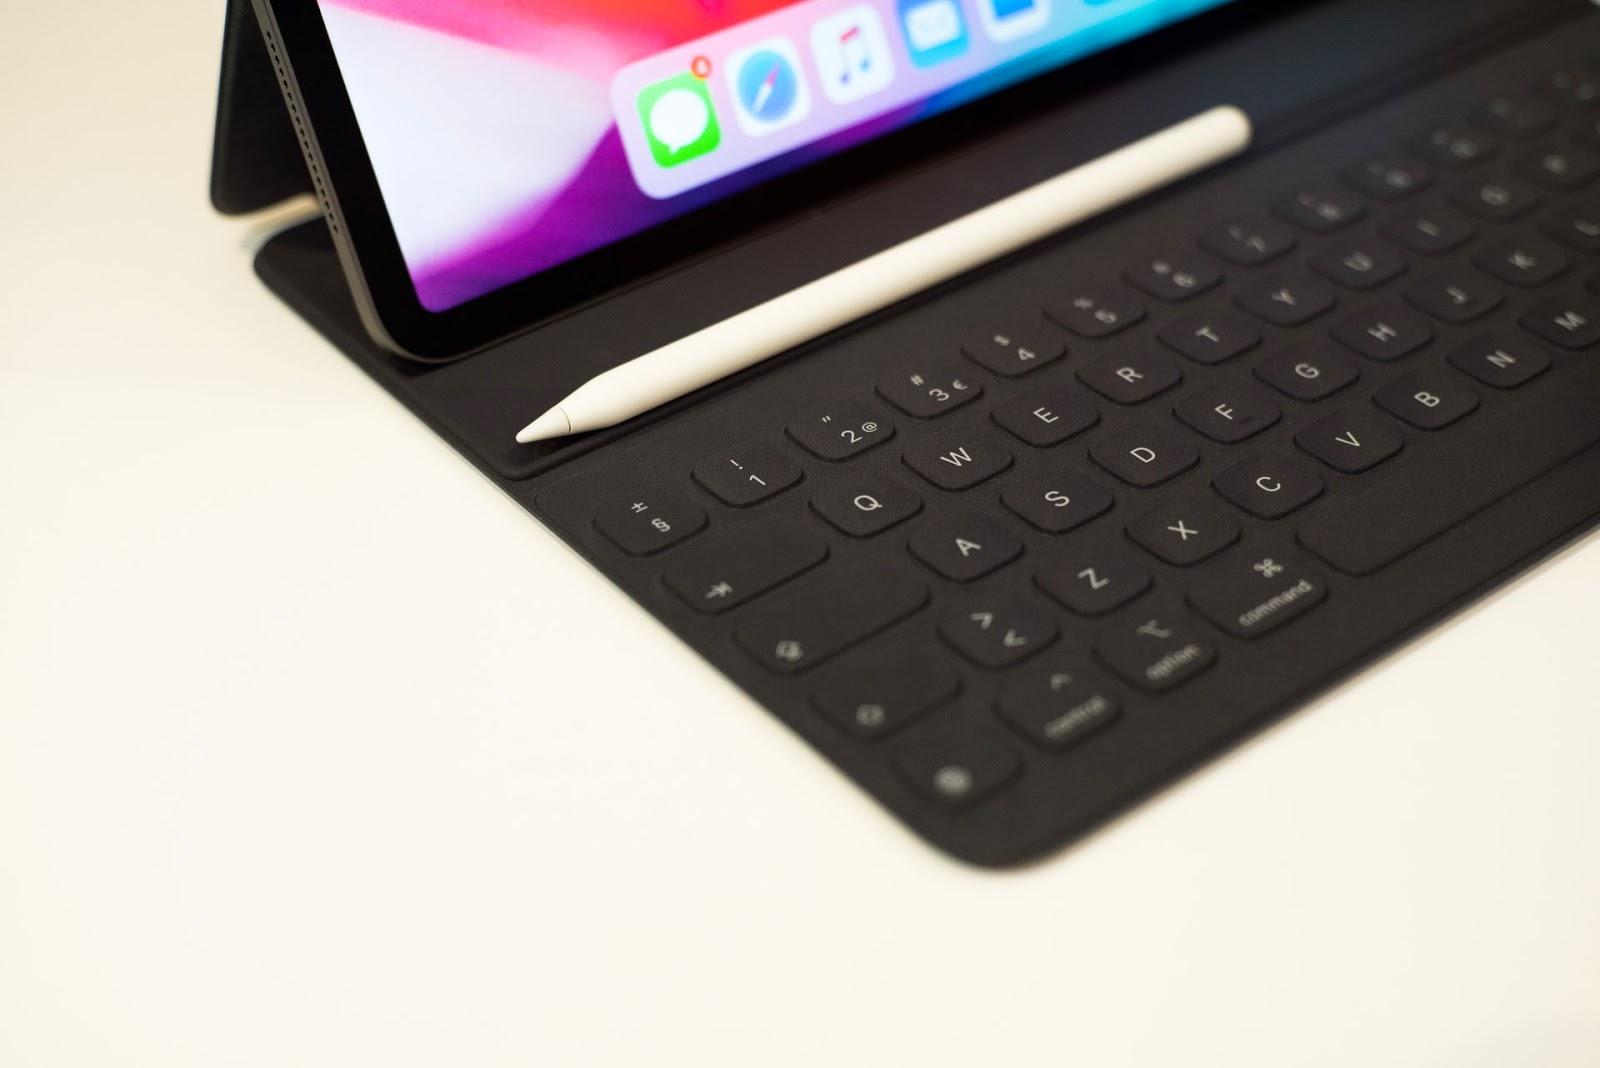 apple pencil resting on ipad keyboard